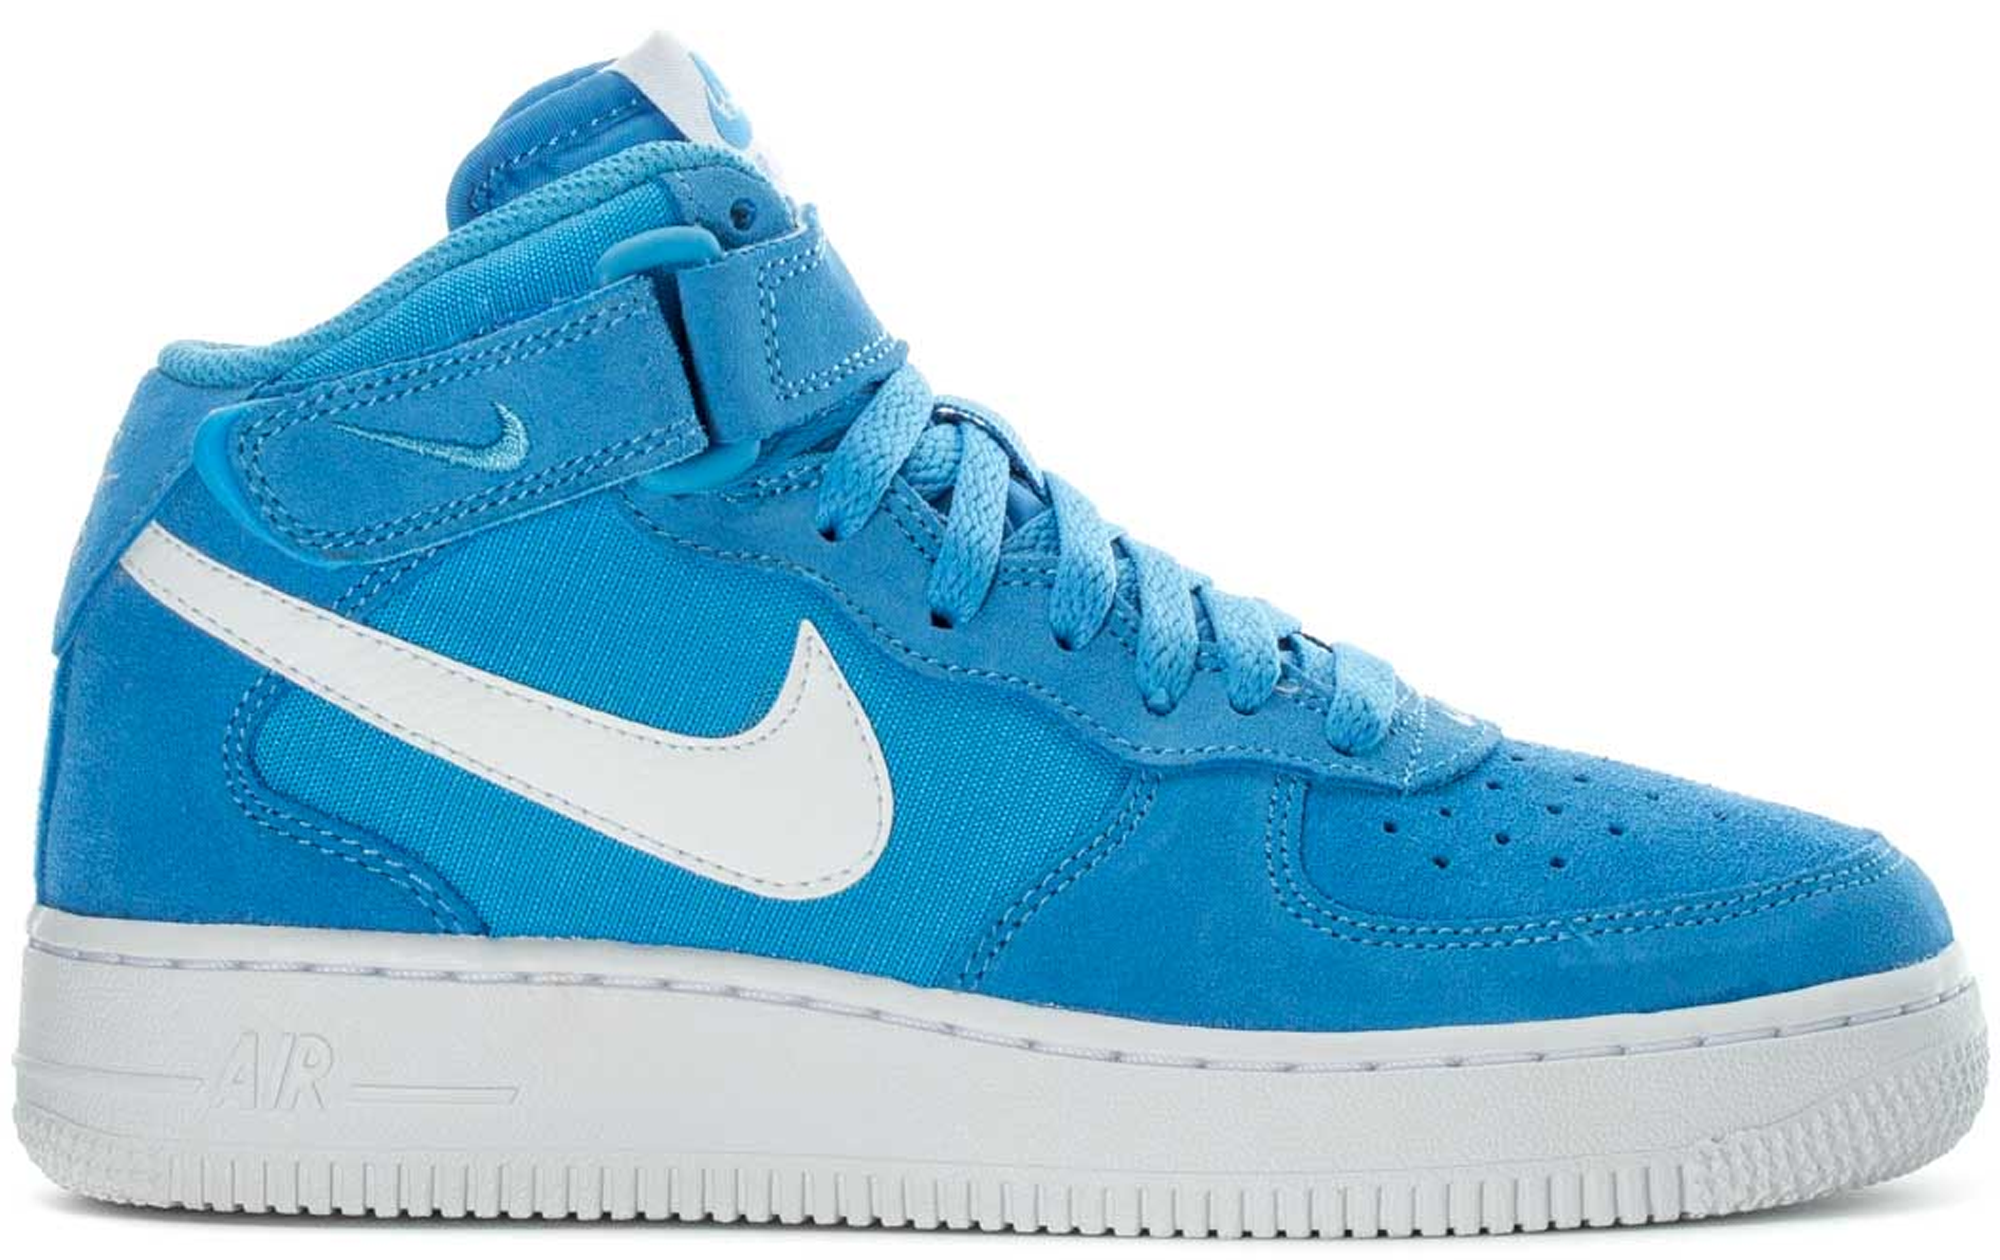 Nike Air Force 1 Mid University Blue